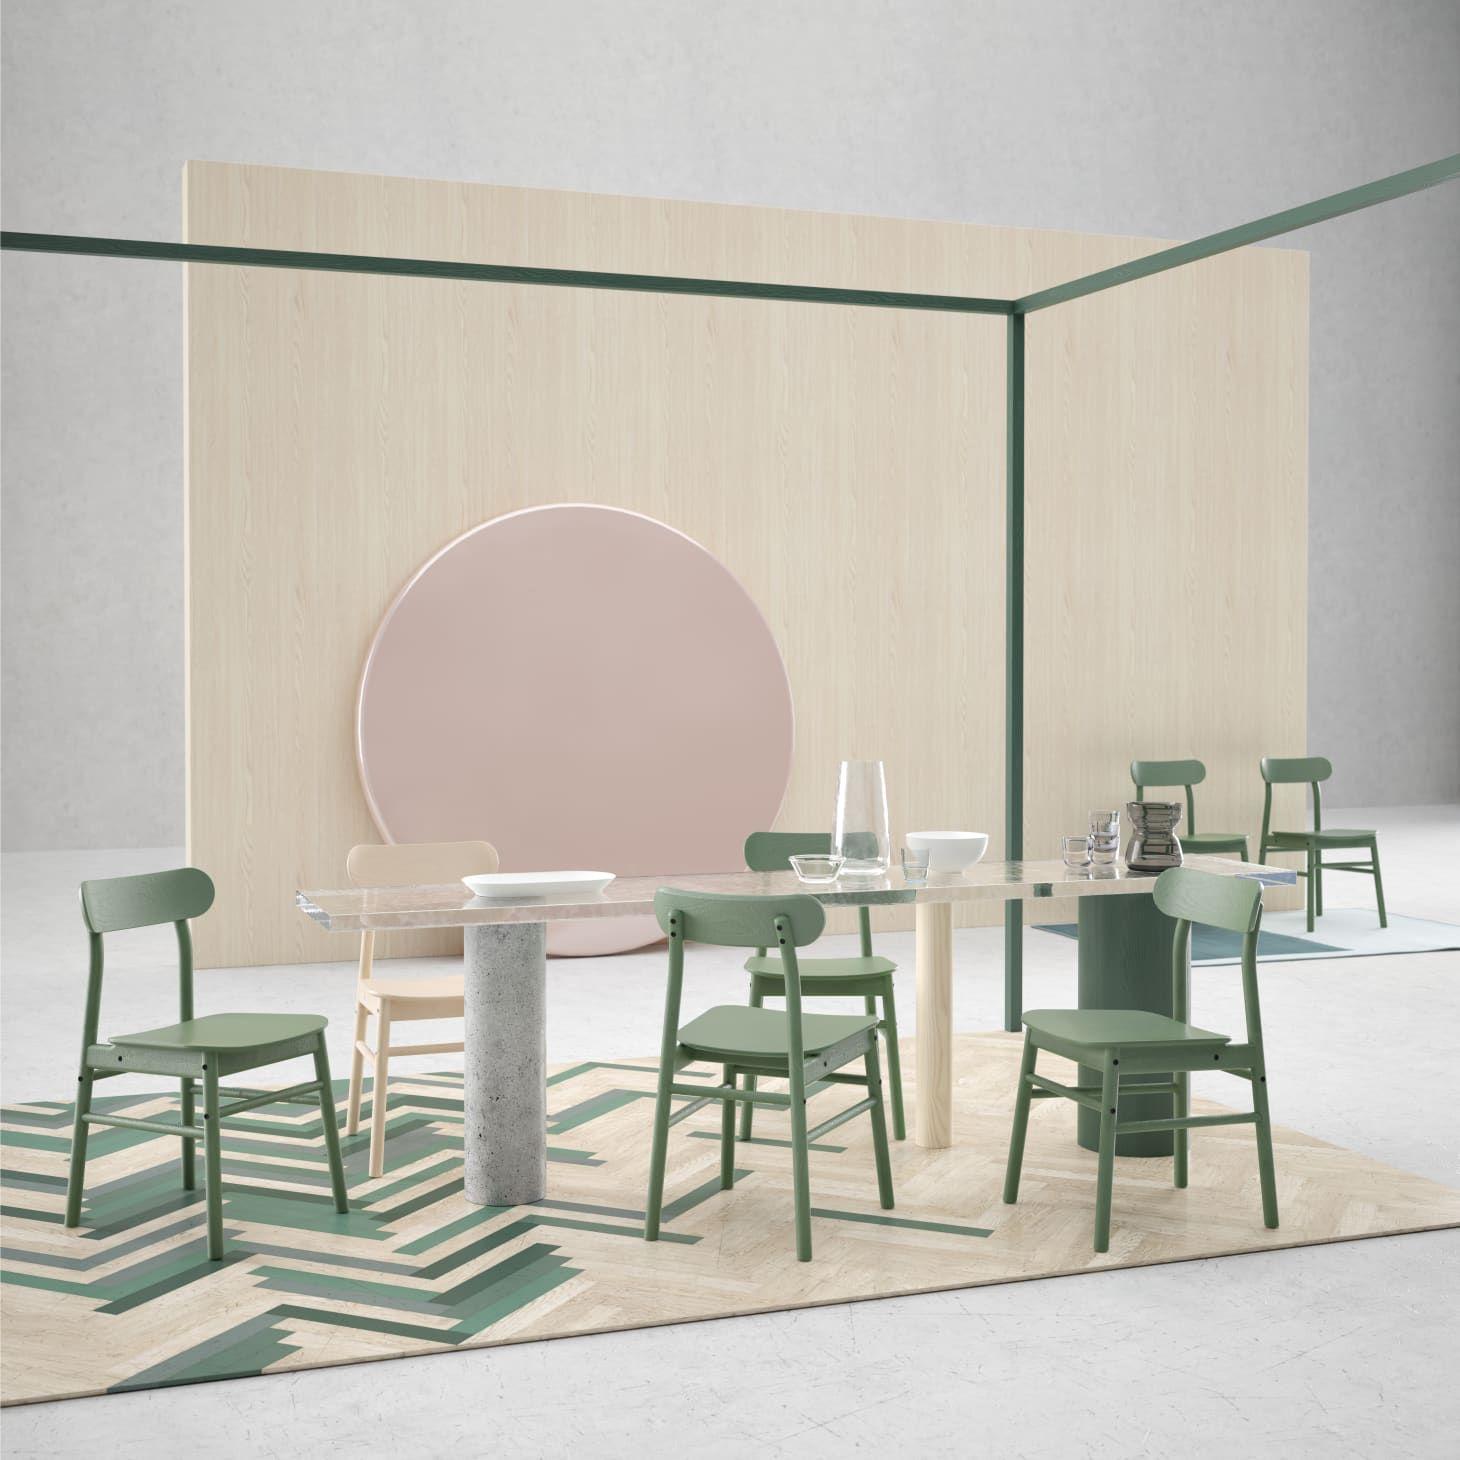 IKEA RONNINGE Green Chair in 2019 Ikea dining table